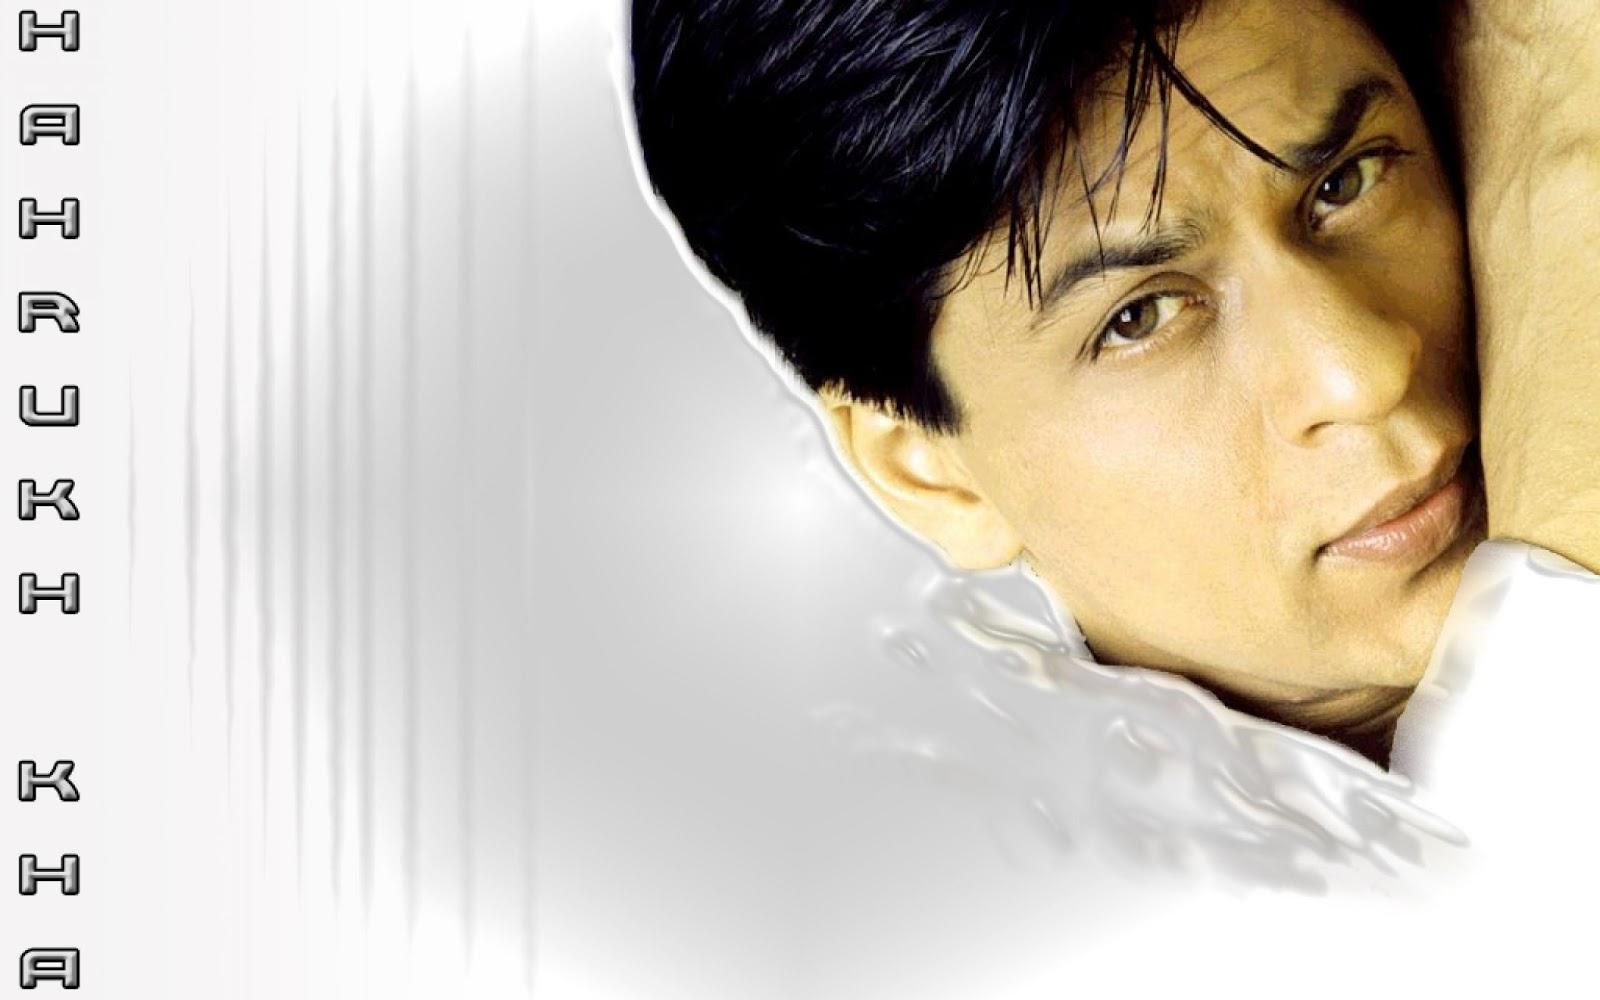 Shahrukh Khan Wallpapers Hd Download Free 1080p: HD Wallpapers Fine: Shahrukh Khan,shahrukh Khan House